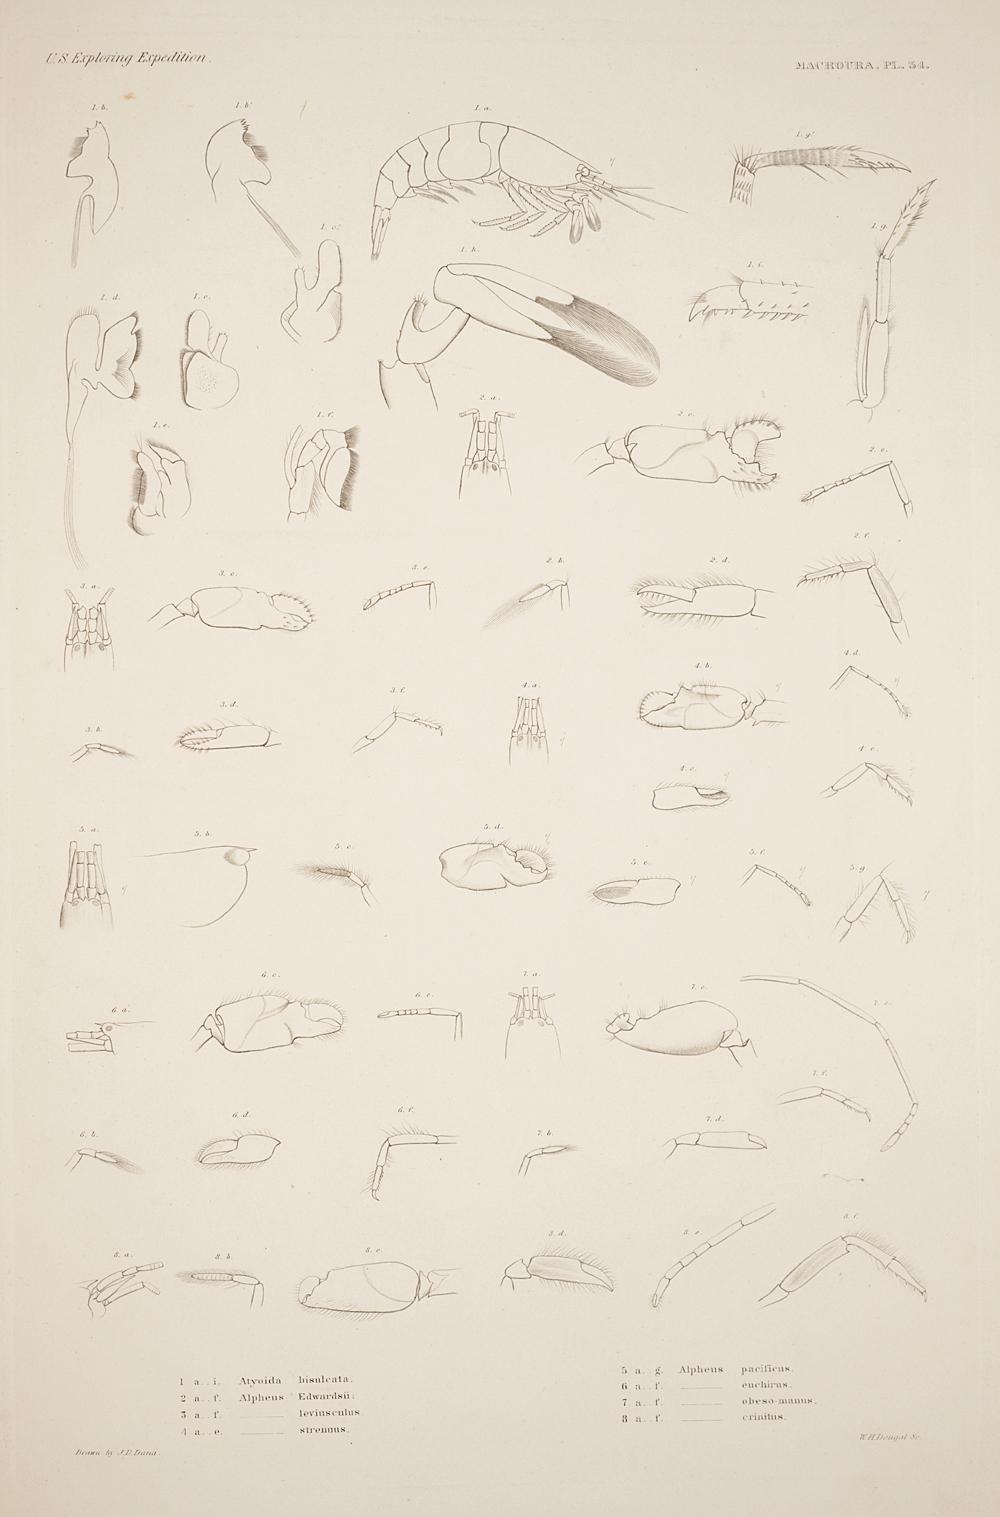 Macroura. Pl. 34,  Image number:SIL19-21-101b